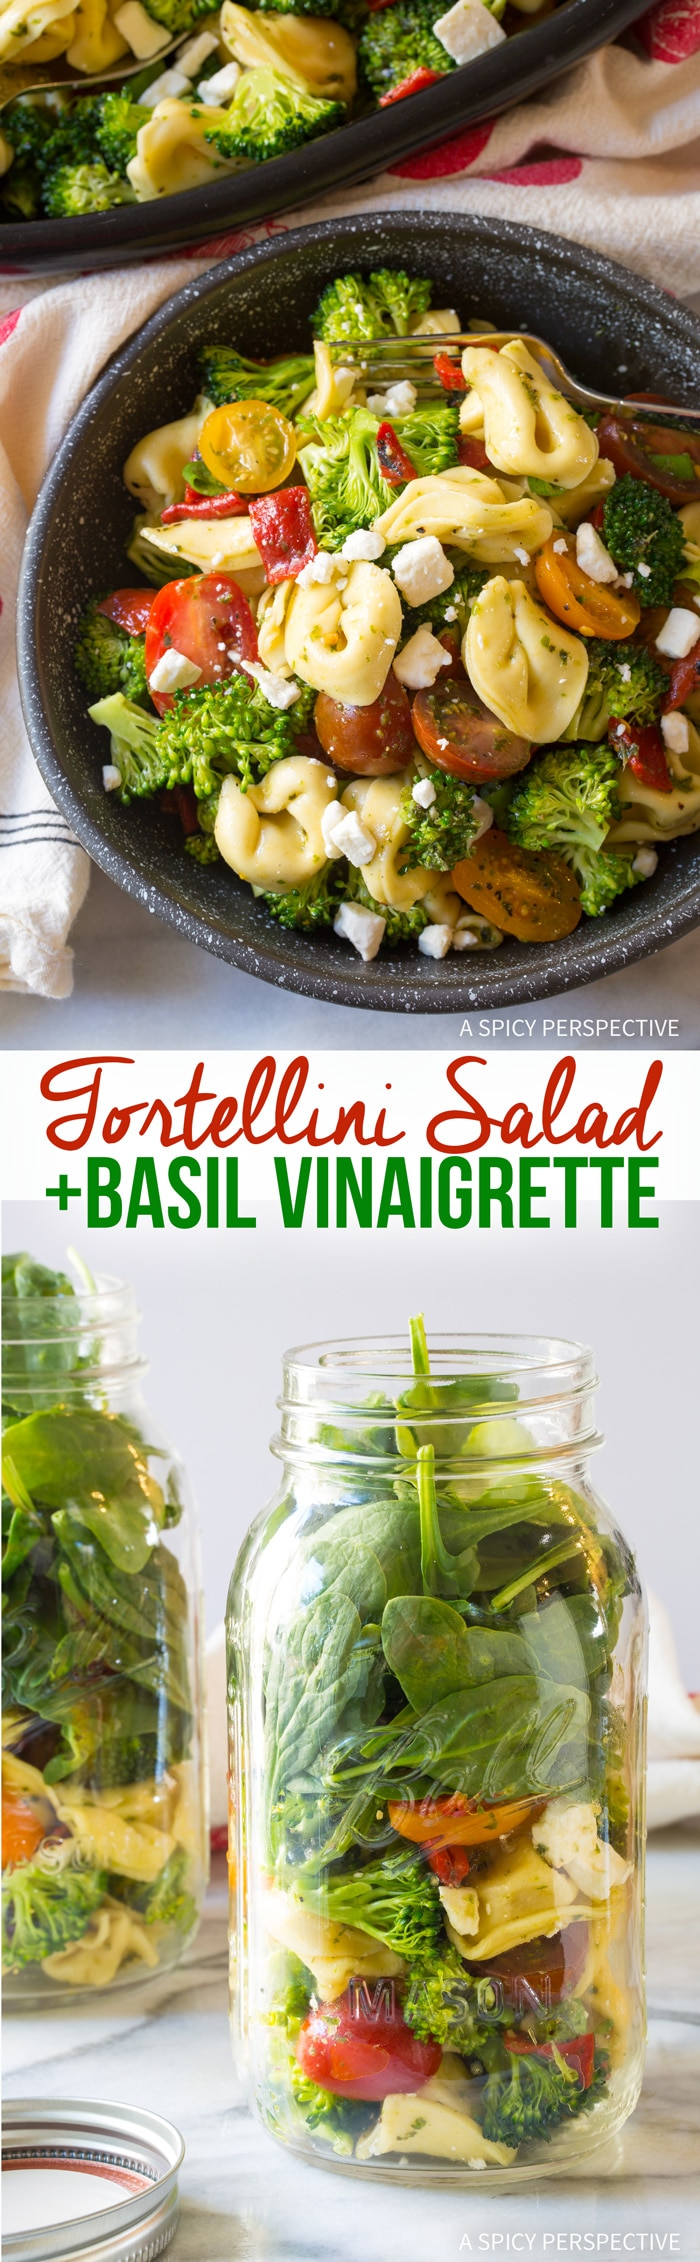 Cold Tortellini Salad with Basil Vinaigrette Recipe